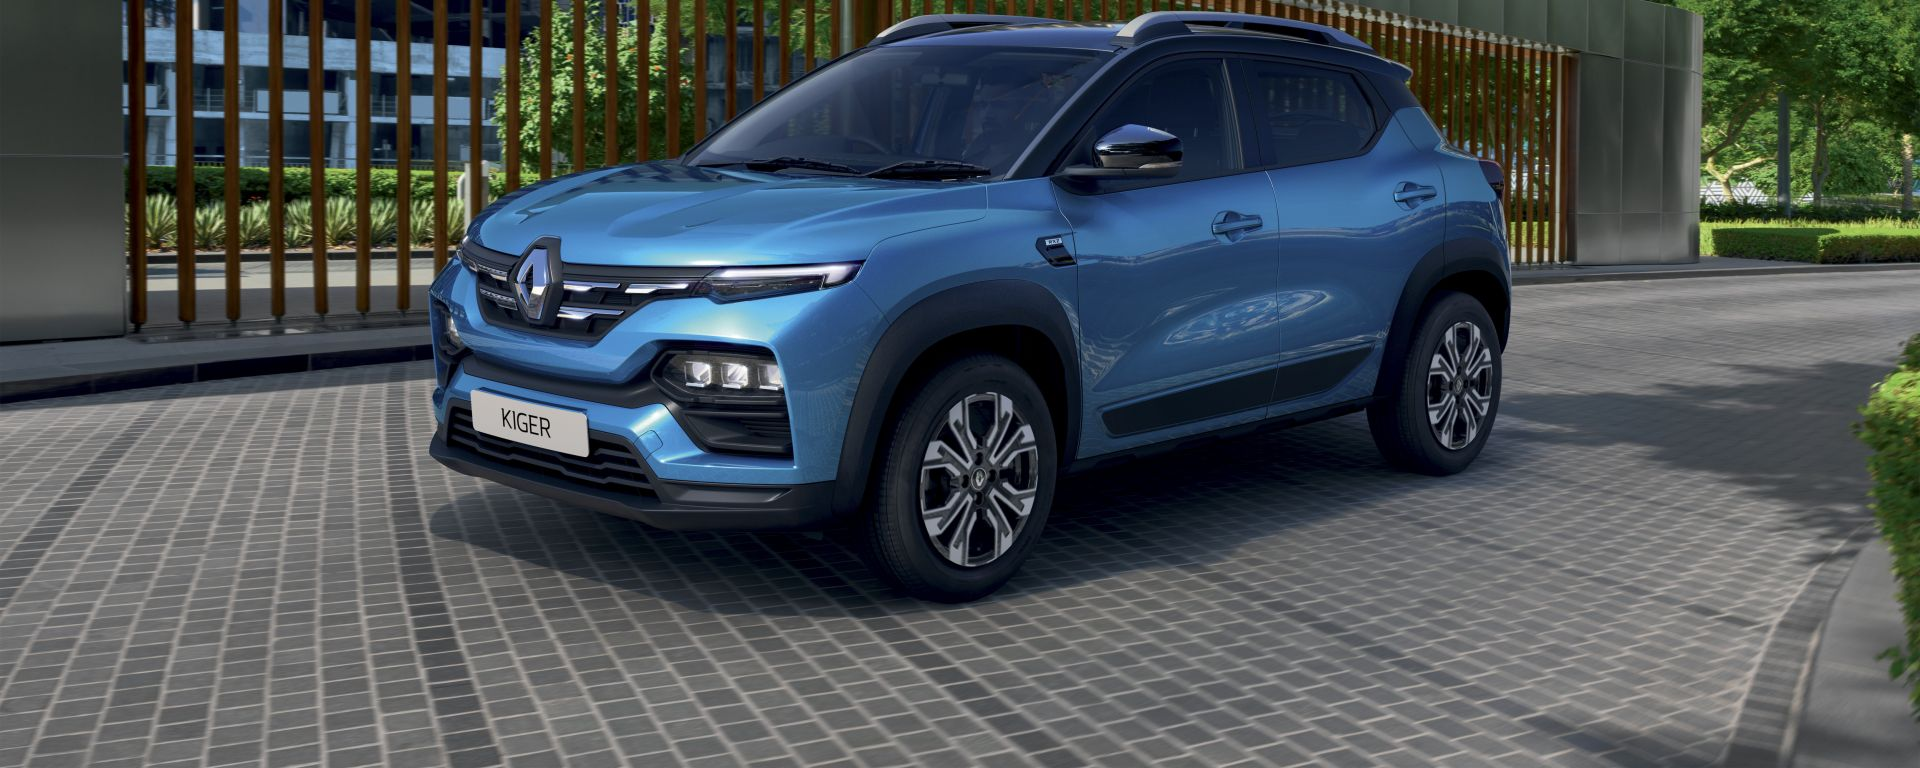 Nuova Renault Kiger